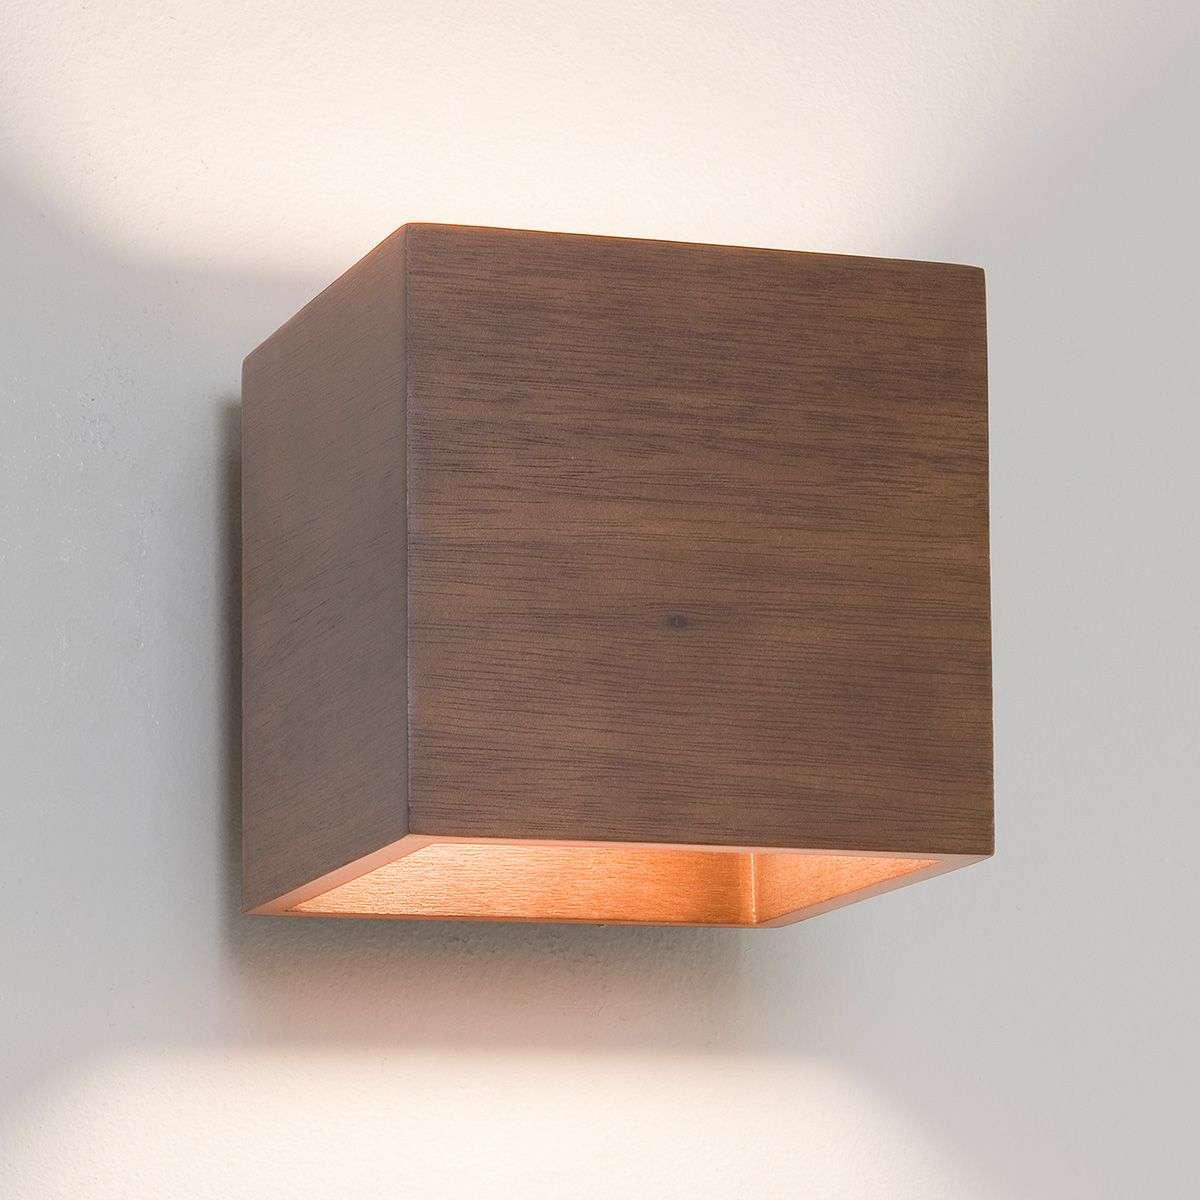 Cremona Wall Light Beautiful Wooden-1020241-33